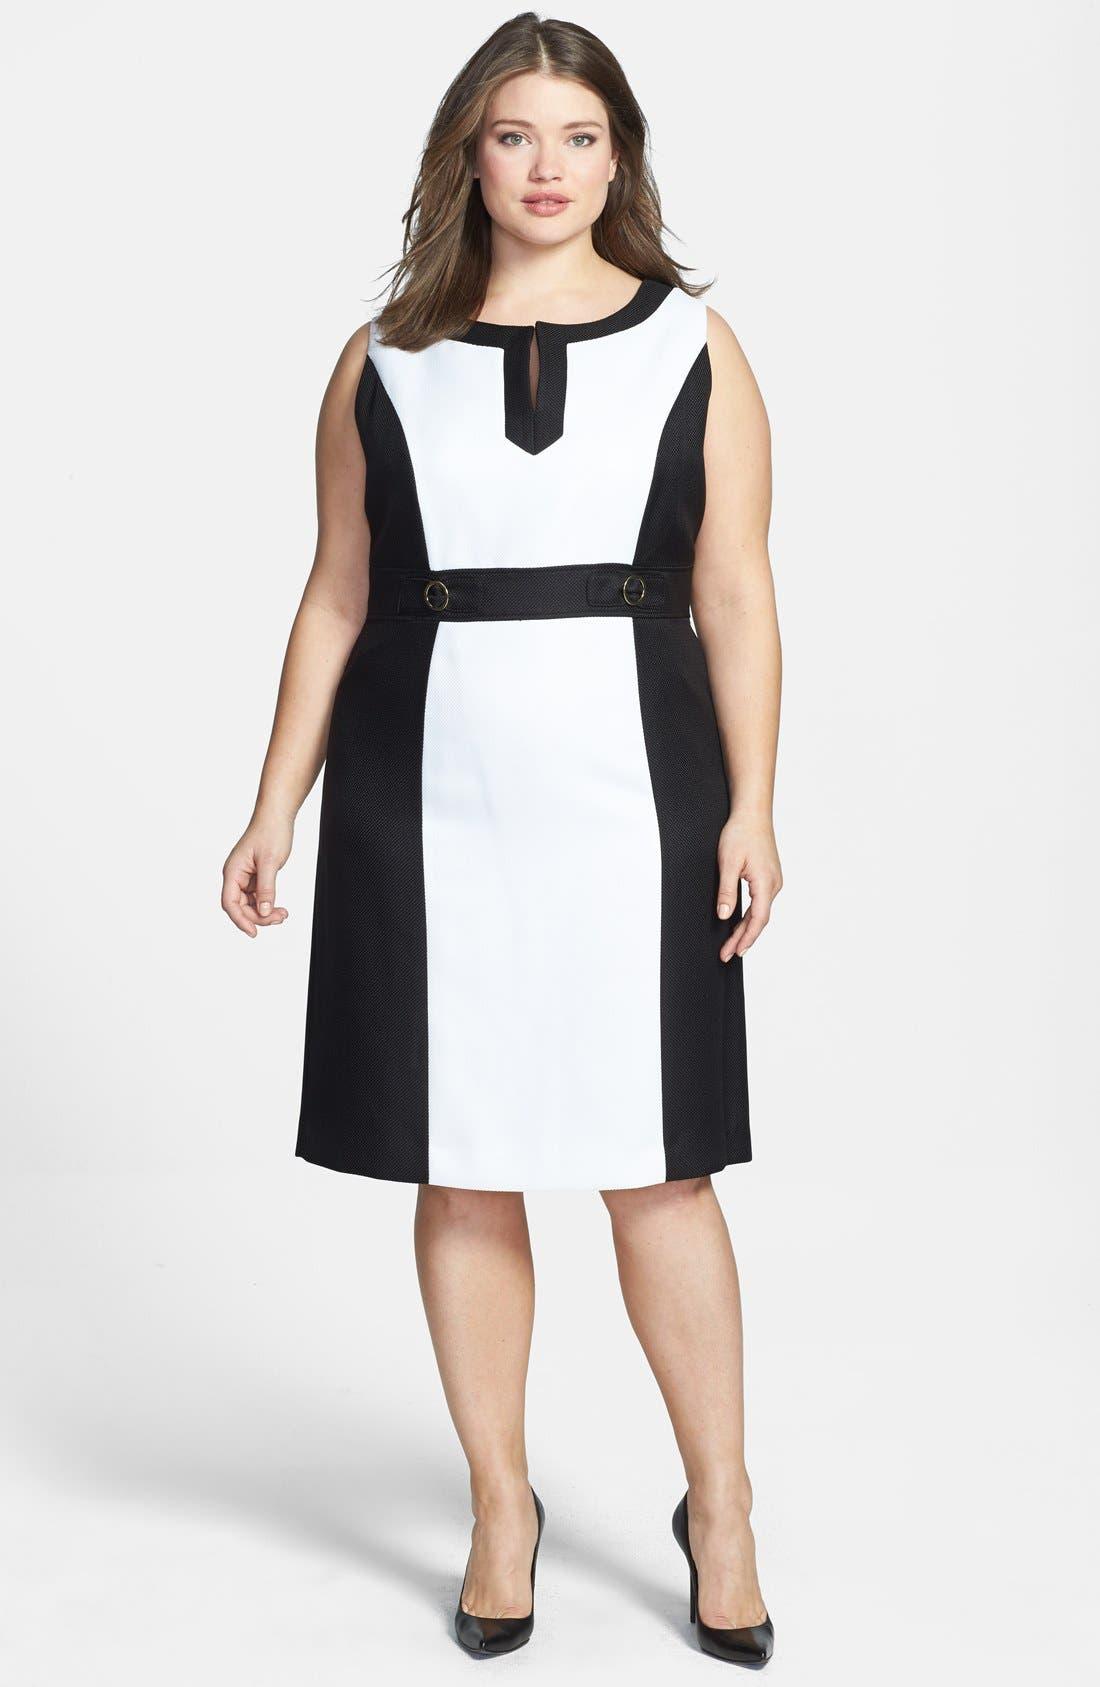 Alternate Image 1 Selected - Tahari by ASL Colorblock Split V-Neck Sheath Dress (Plus Size)